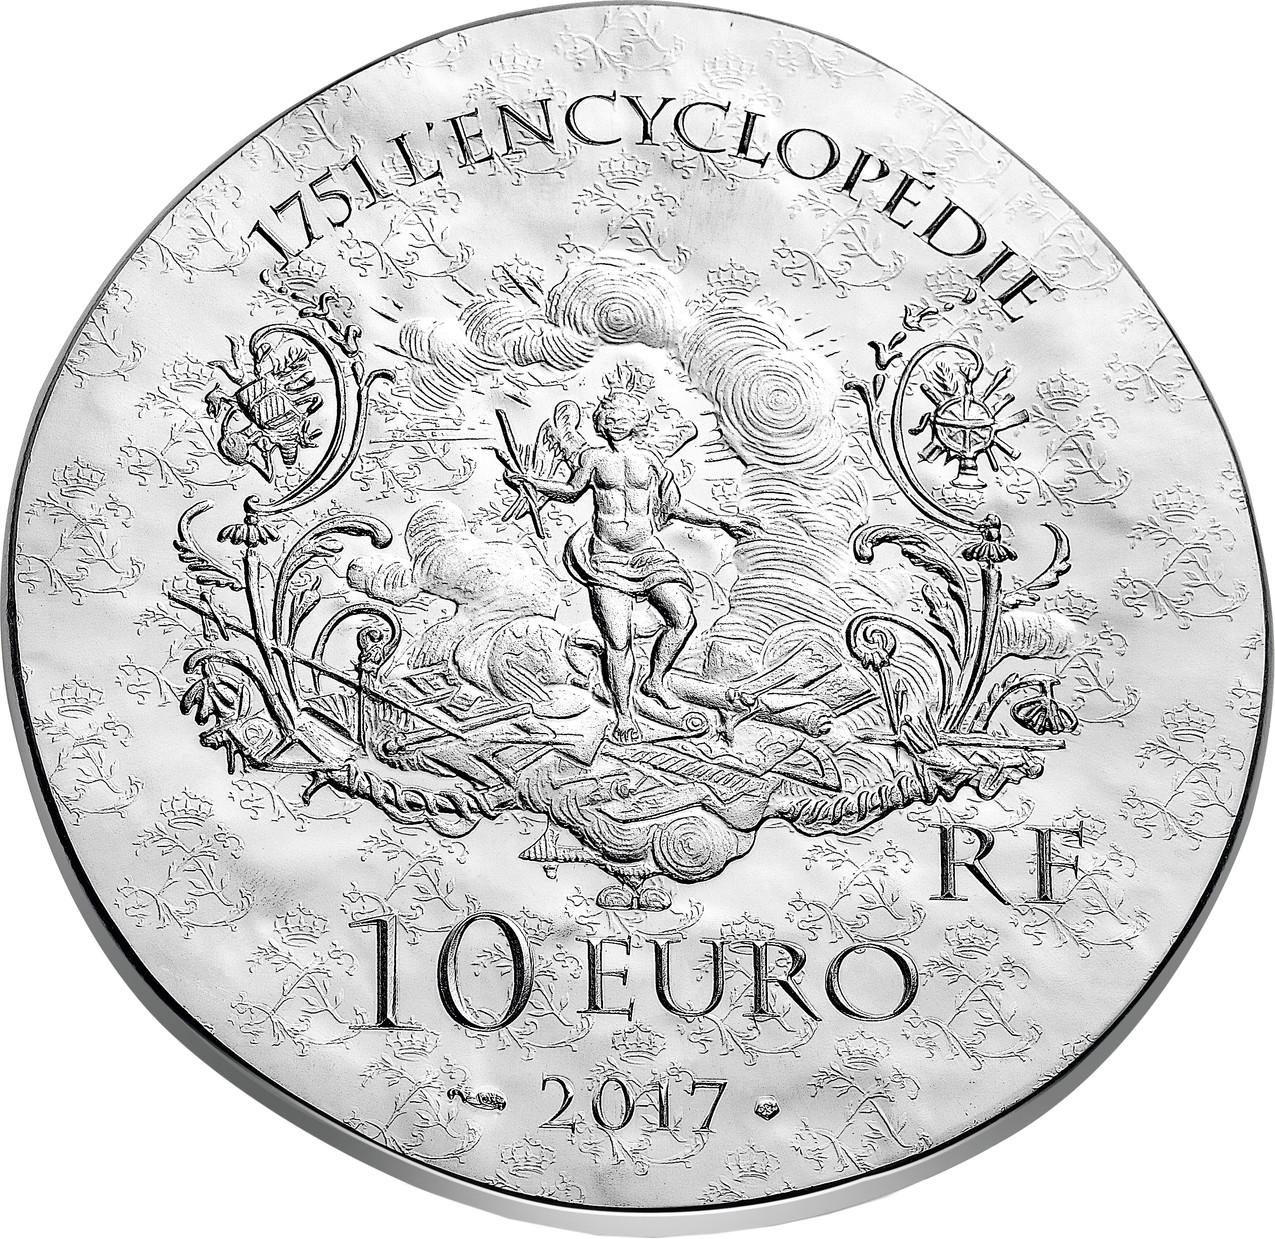 Frankreich,-10-Ôé¼,-Pompadour,-Av.